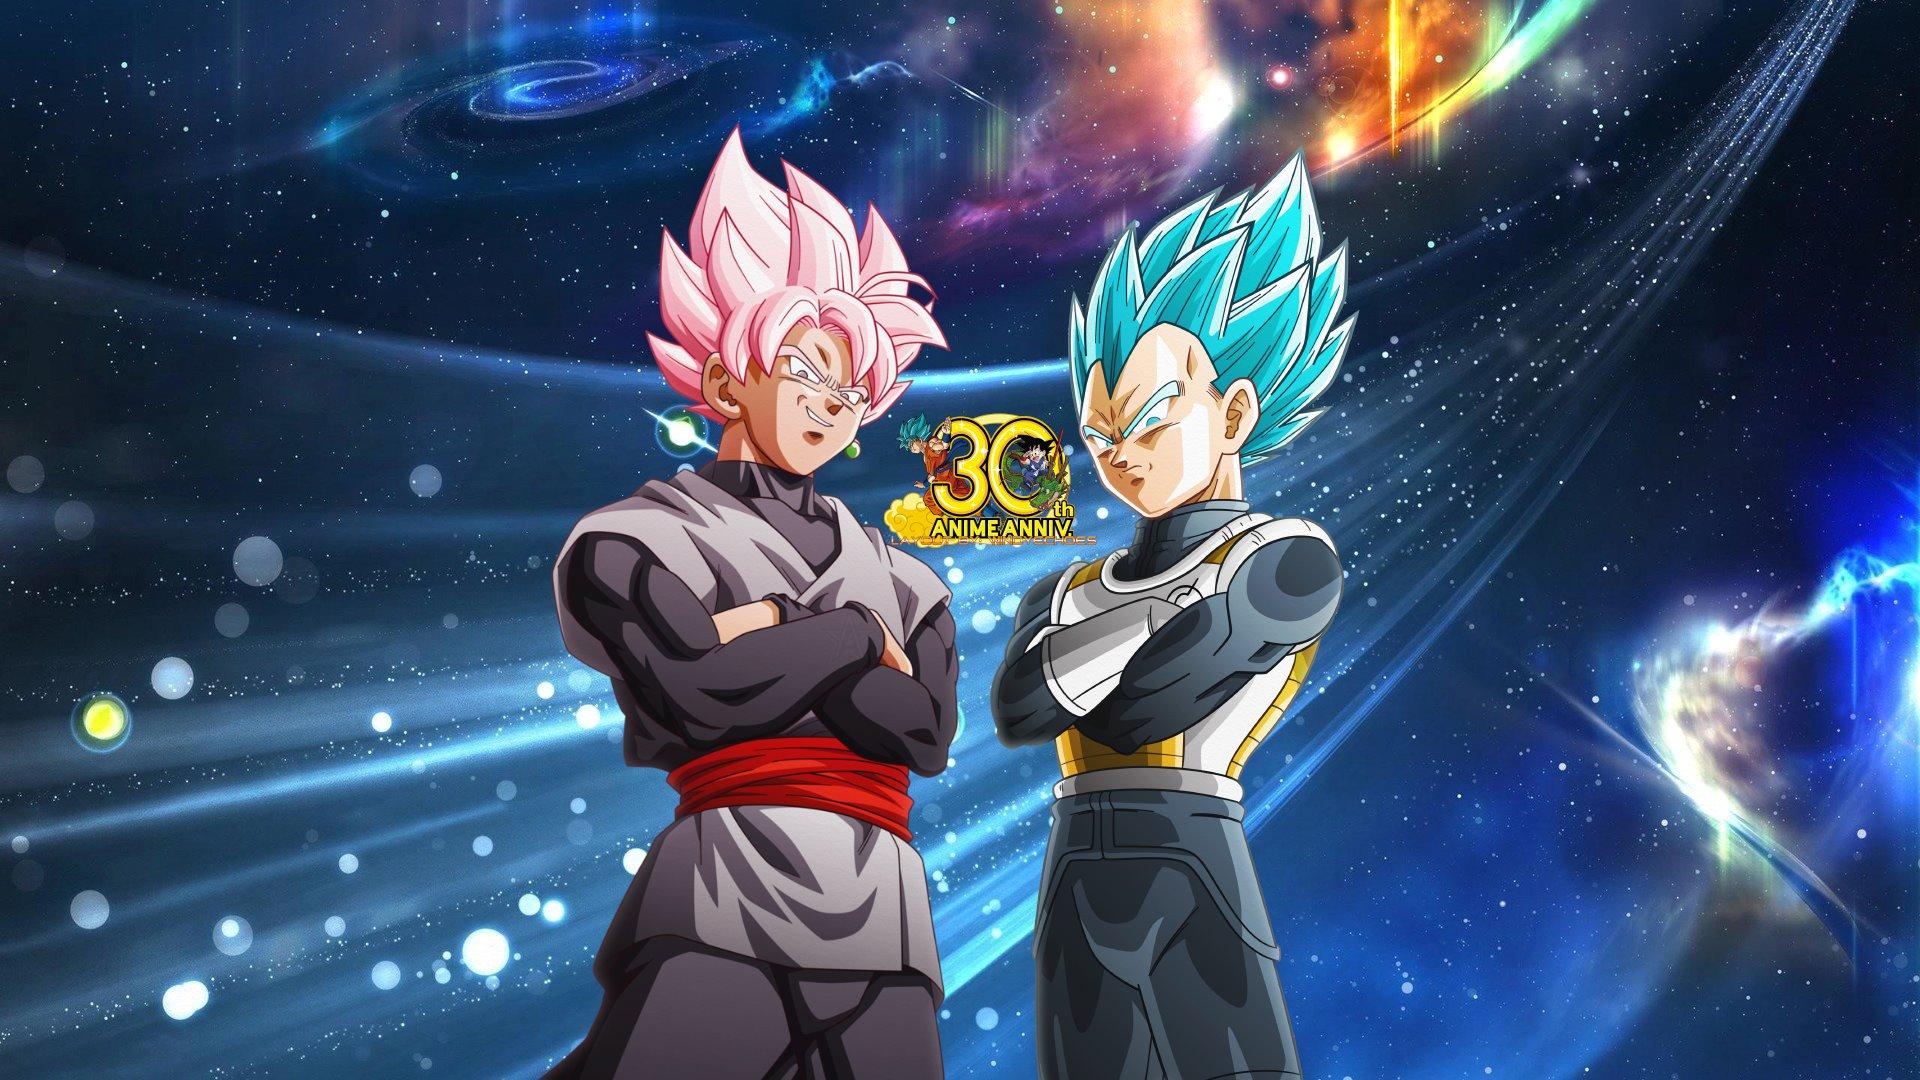 Goku Black And Vegeta Dbs Wallpaper Hd By Windyechoes On